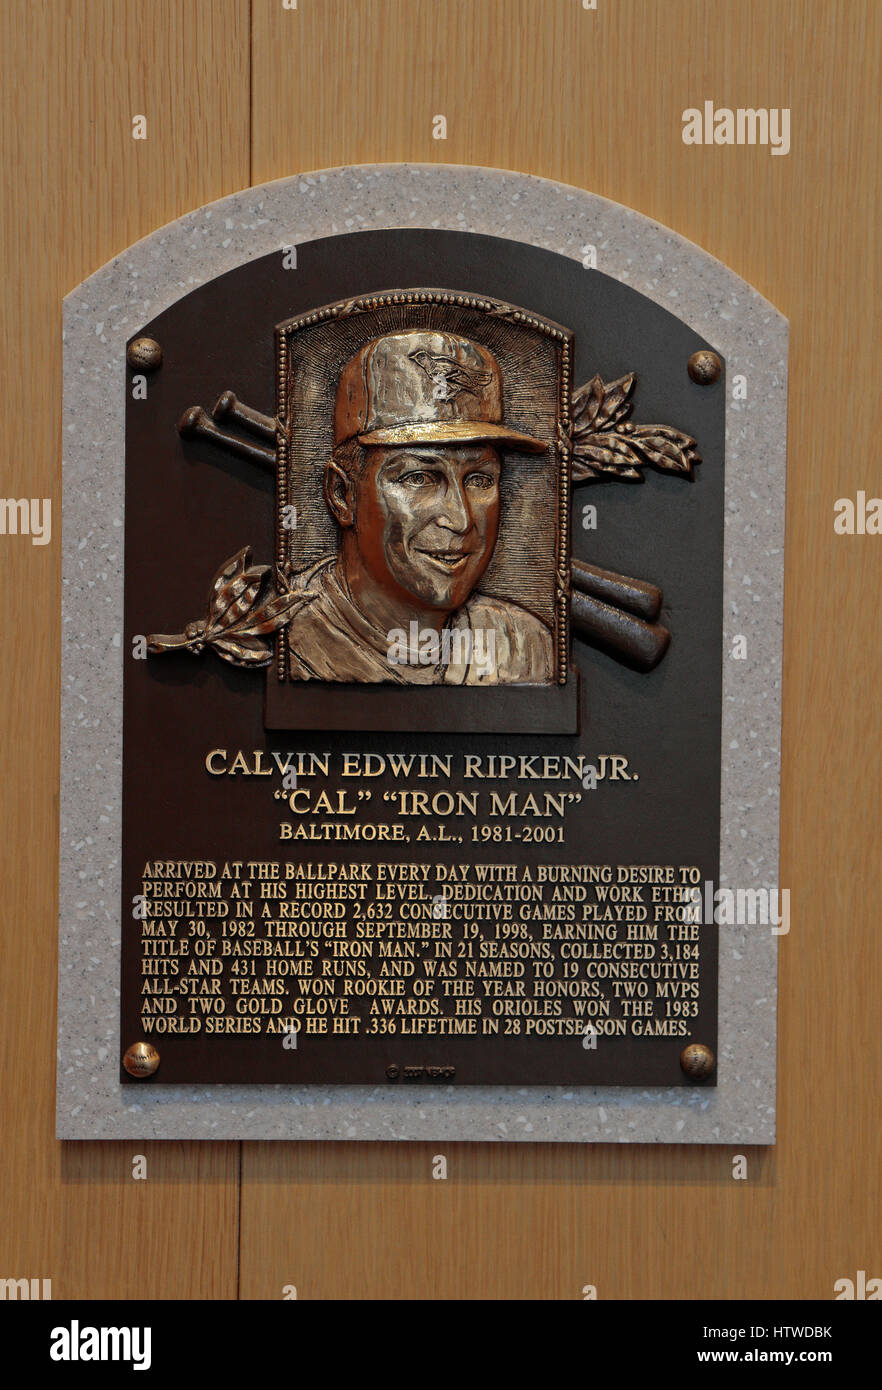 Memorial plaque for shortstop Cal Ripken, Jr. in the Hall of Fame Gallery, National Baseball Hall of Fame & - Stock Image